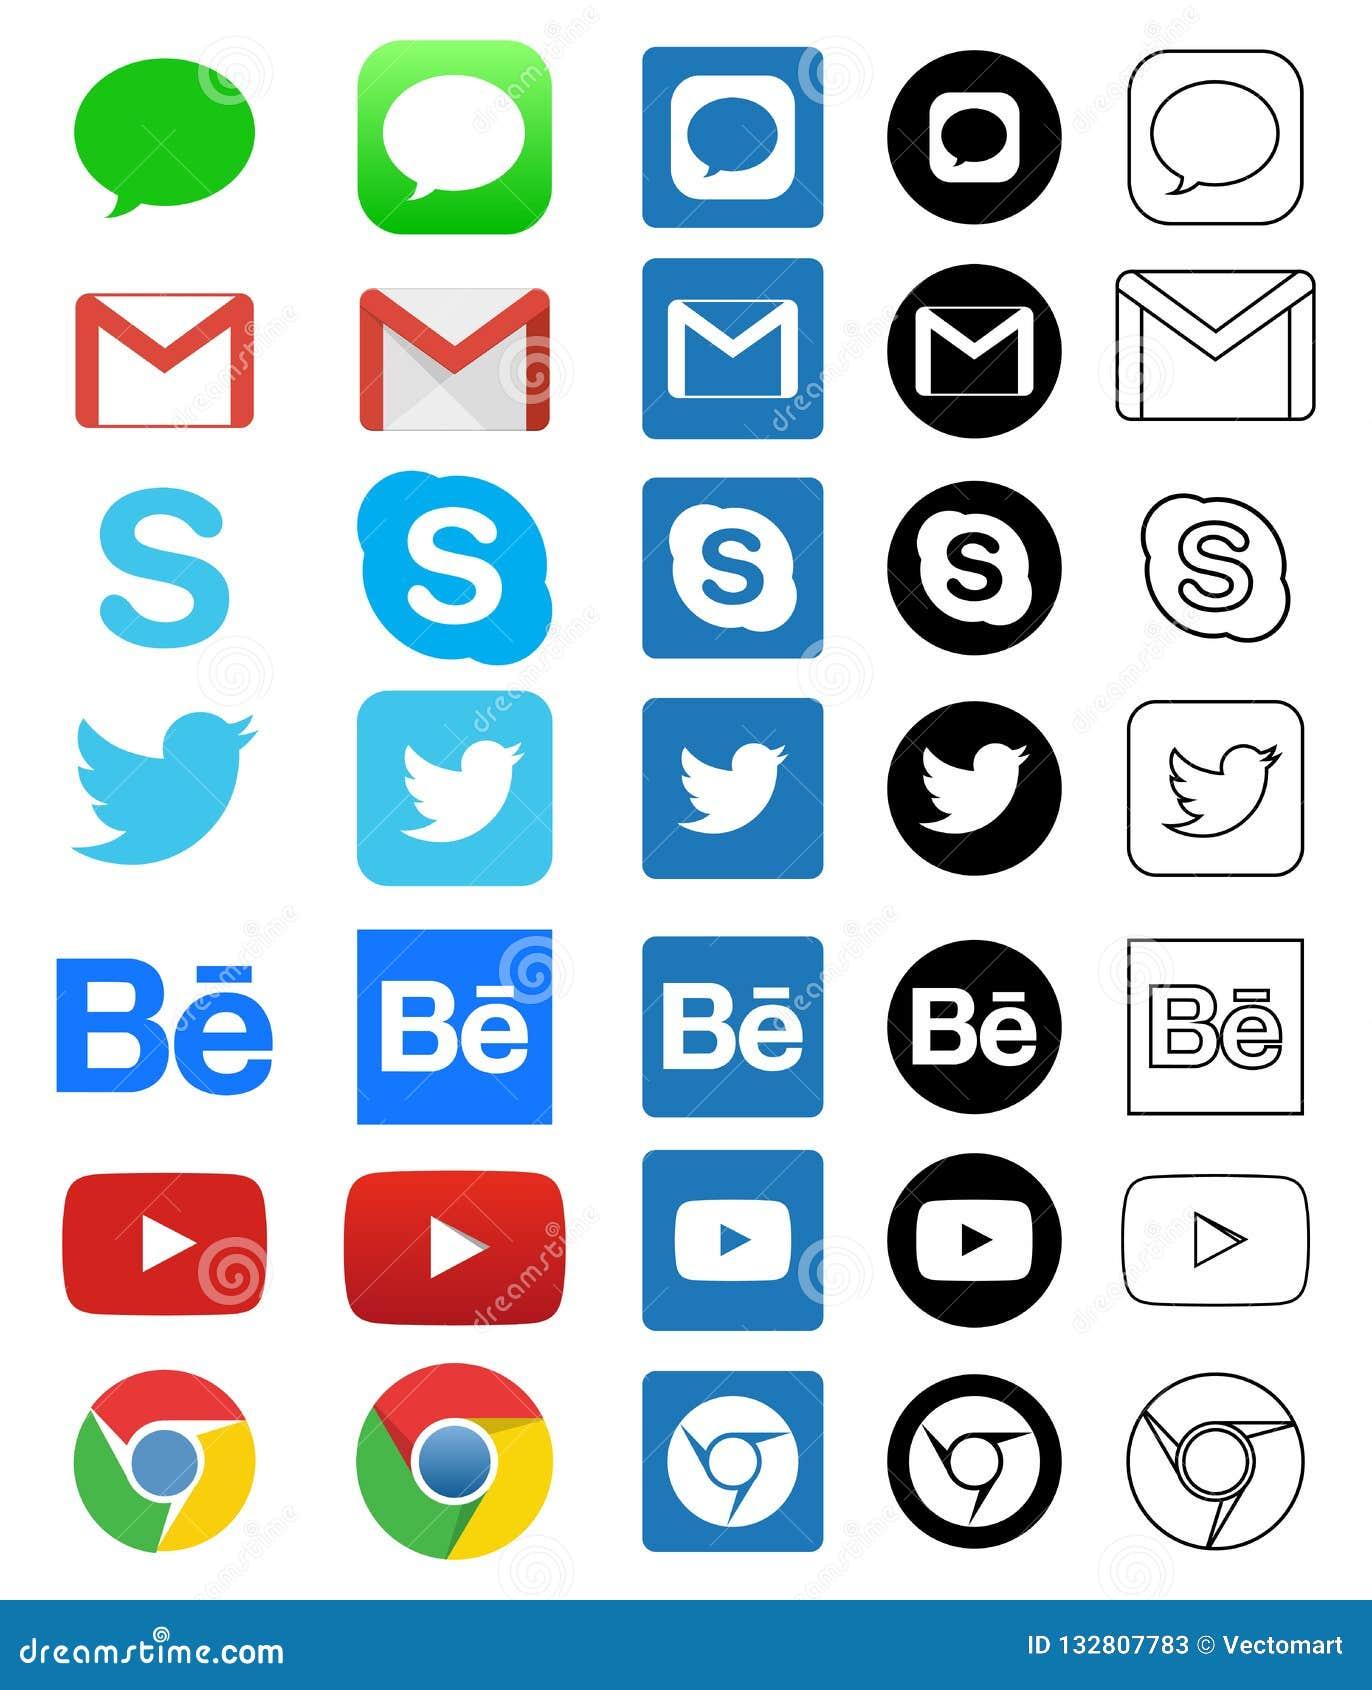 Illustrative editorial of social media icon for Facebook, Whatsapp, Skype,  Youtube, Instagram, Snapchat, Hangout Twitter d408021339